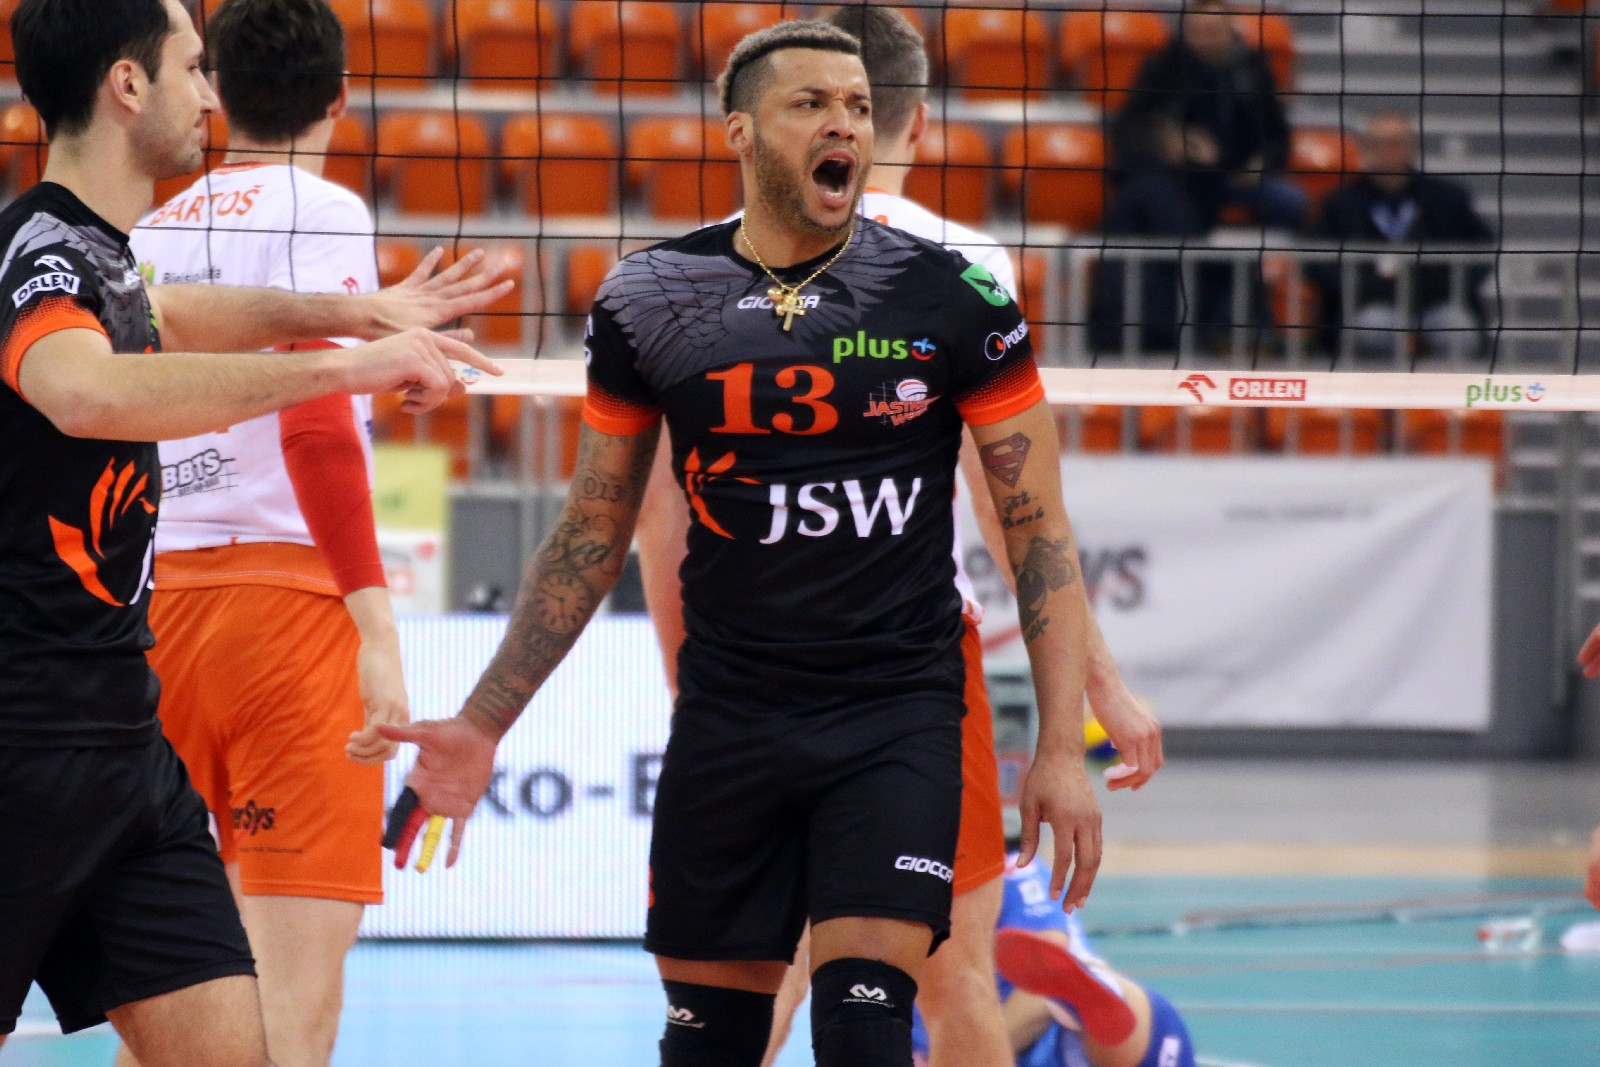 32 - Salvador Hidalgo Oliva